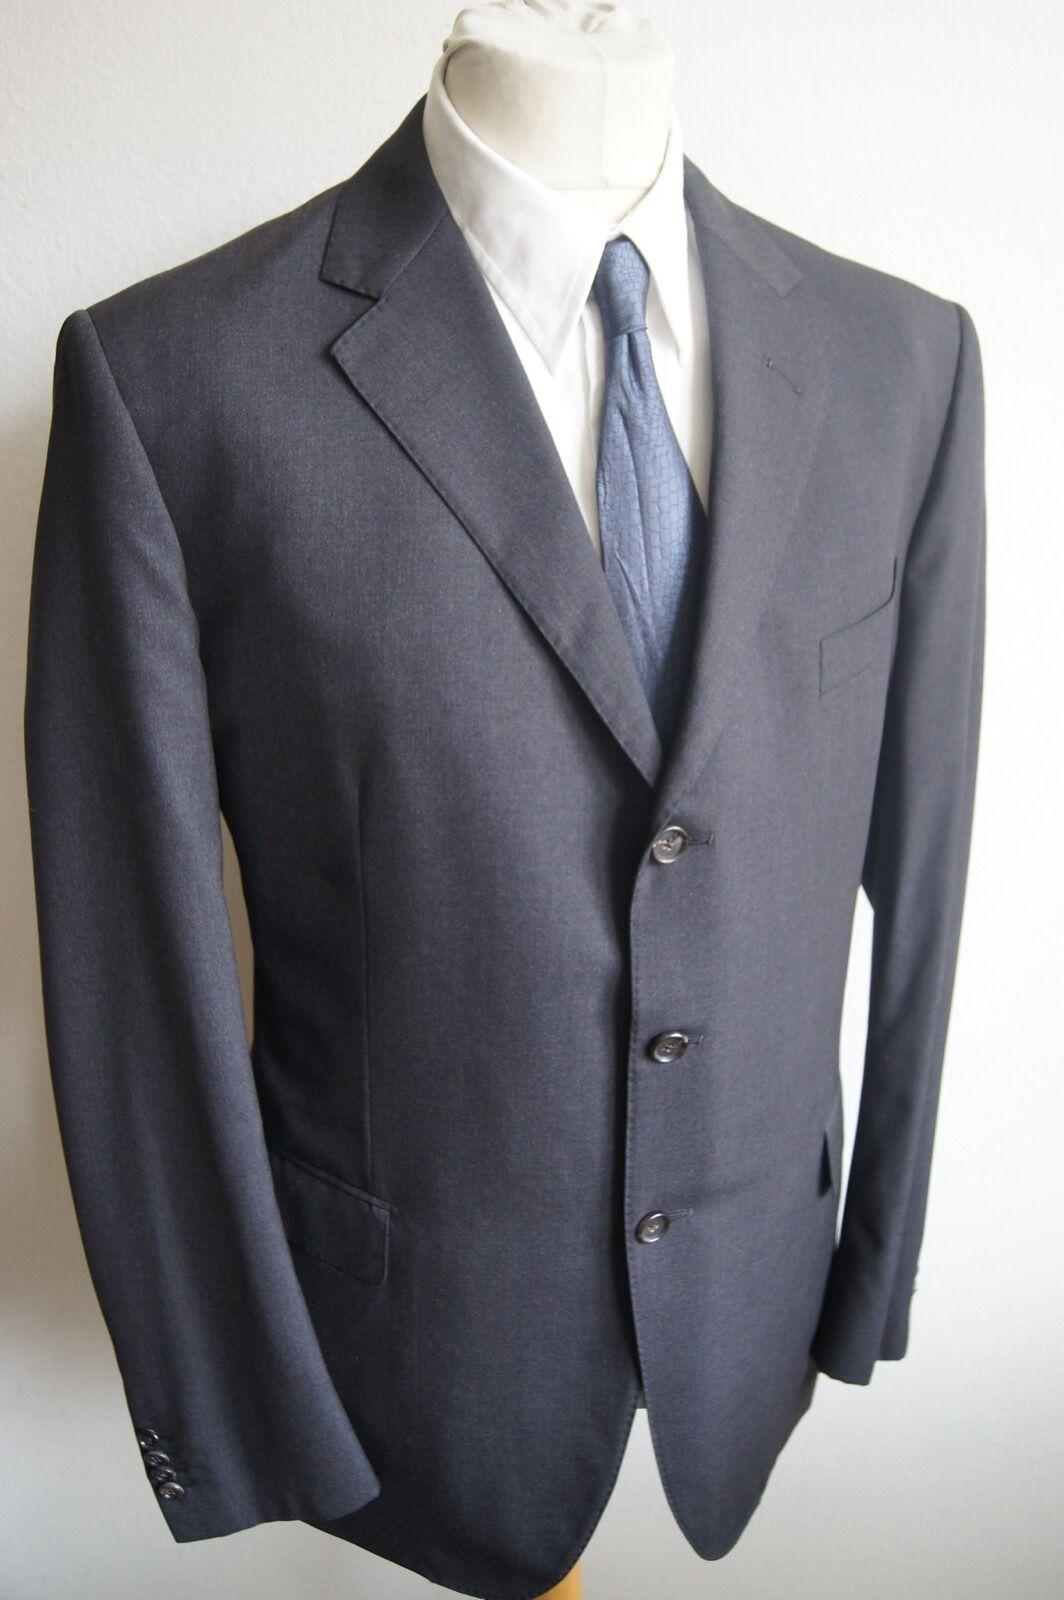 CARUSO Anzug Superfine 150s Sakko Hose grau Gr. 56 suit NP 1600,-- - w. NEU